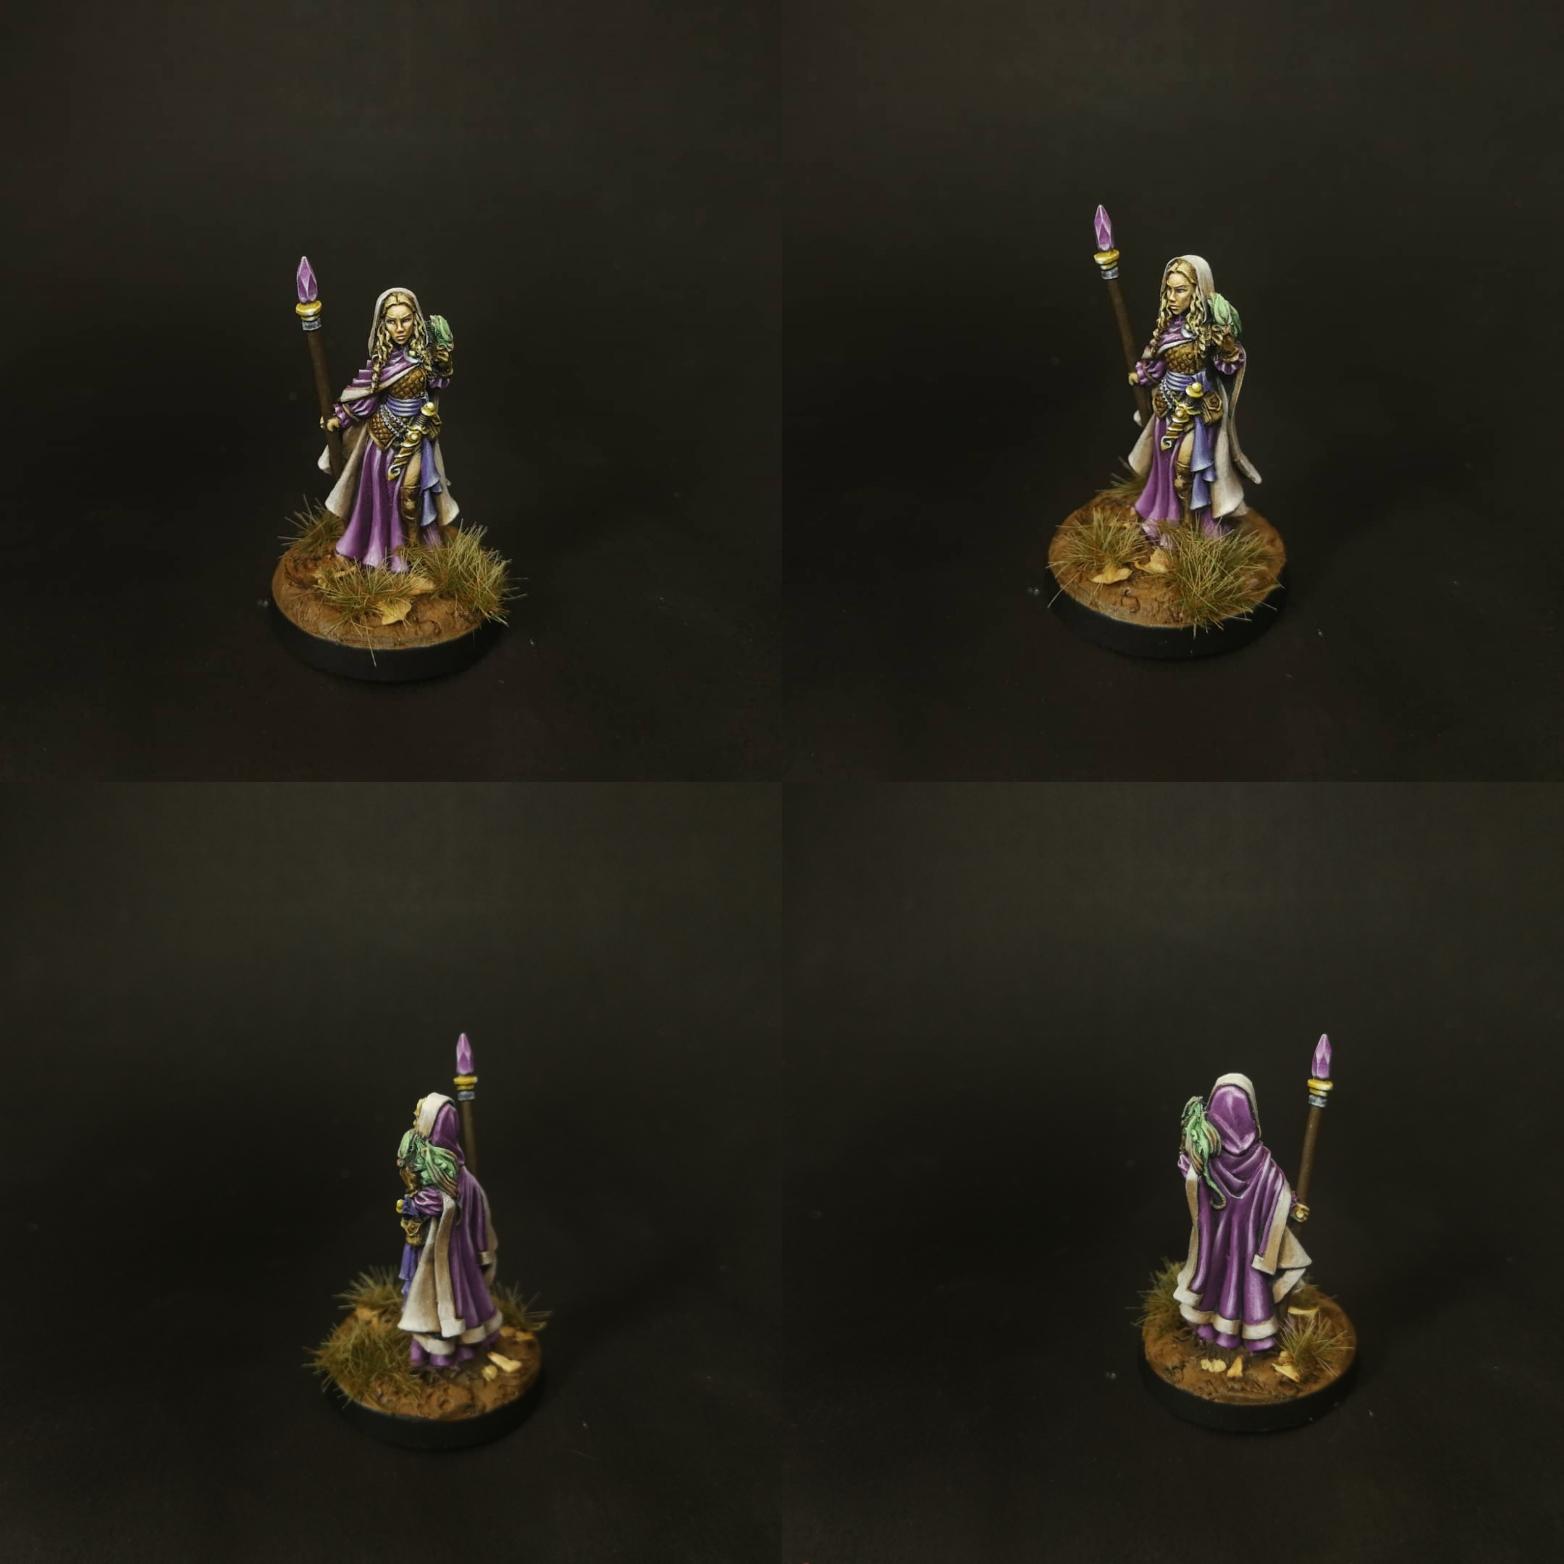 Myrianna of Aelfheim - female elf druid